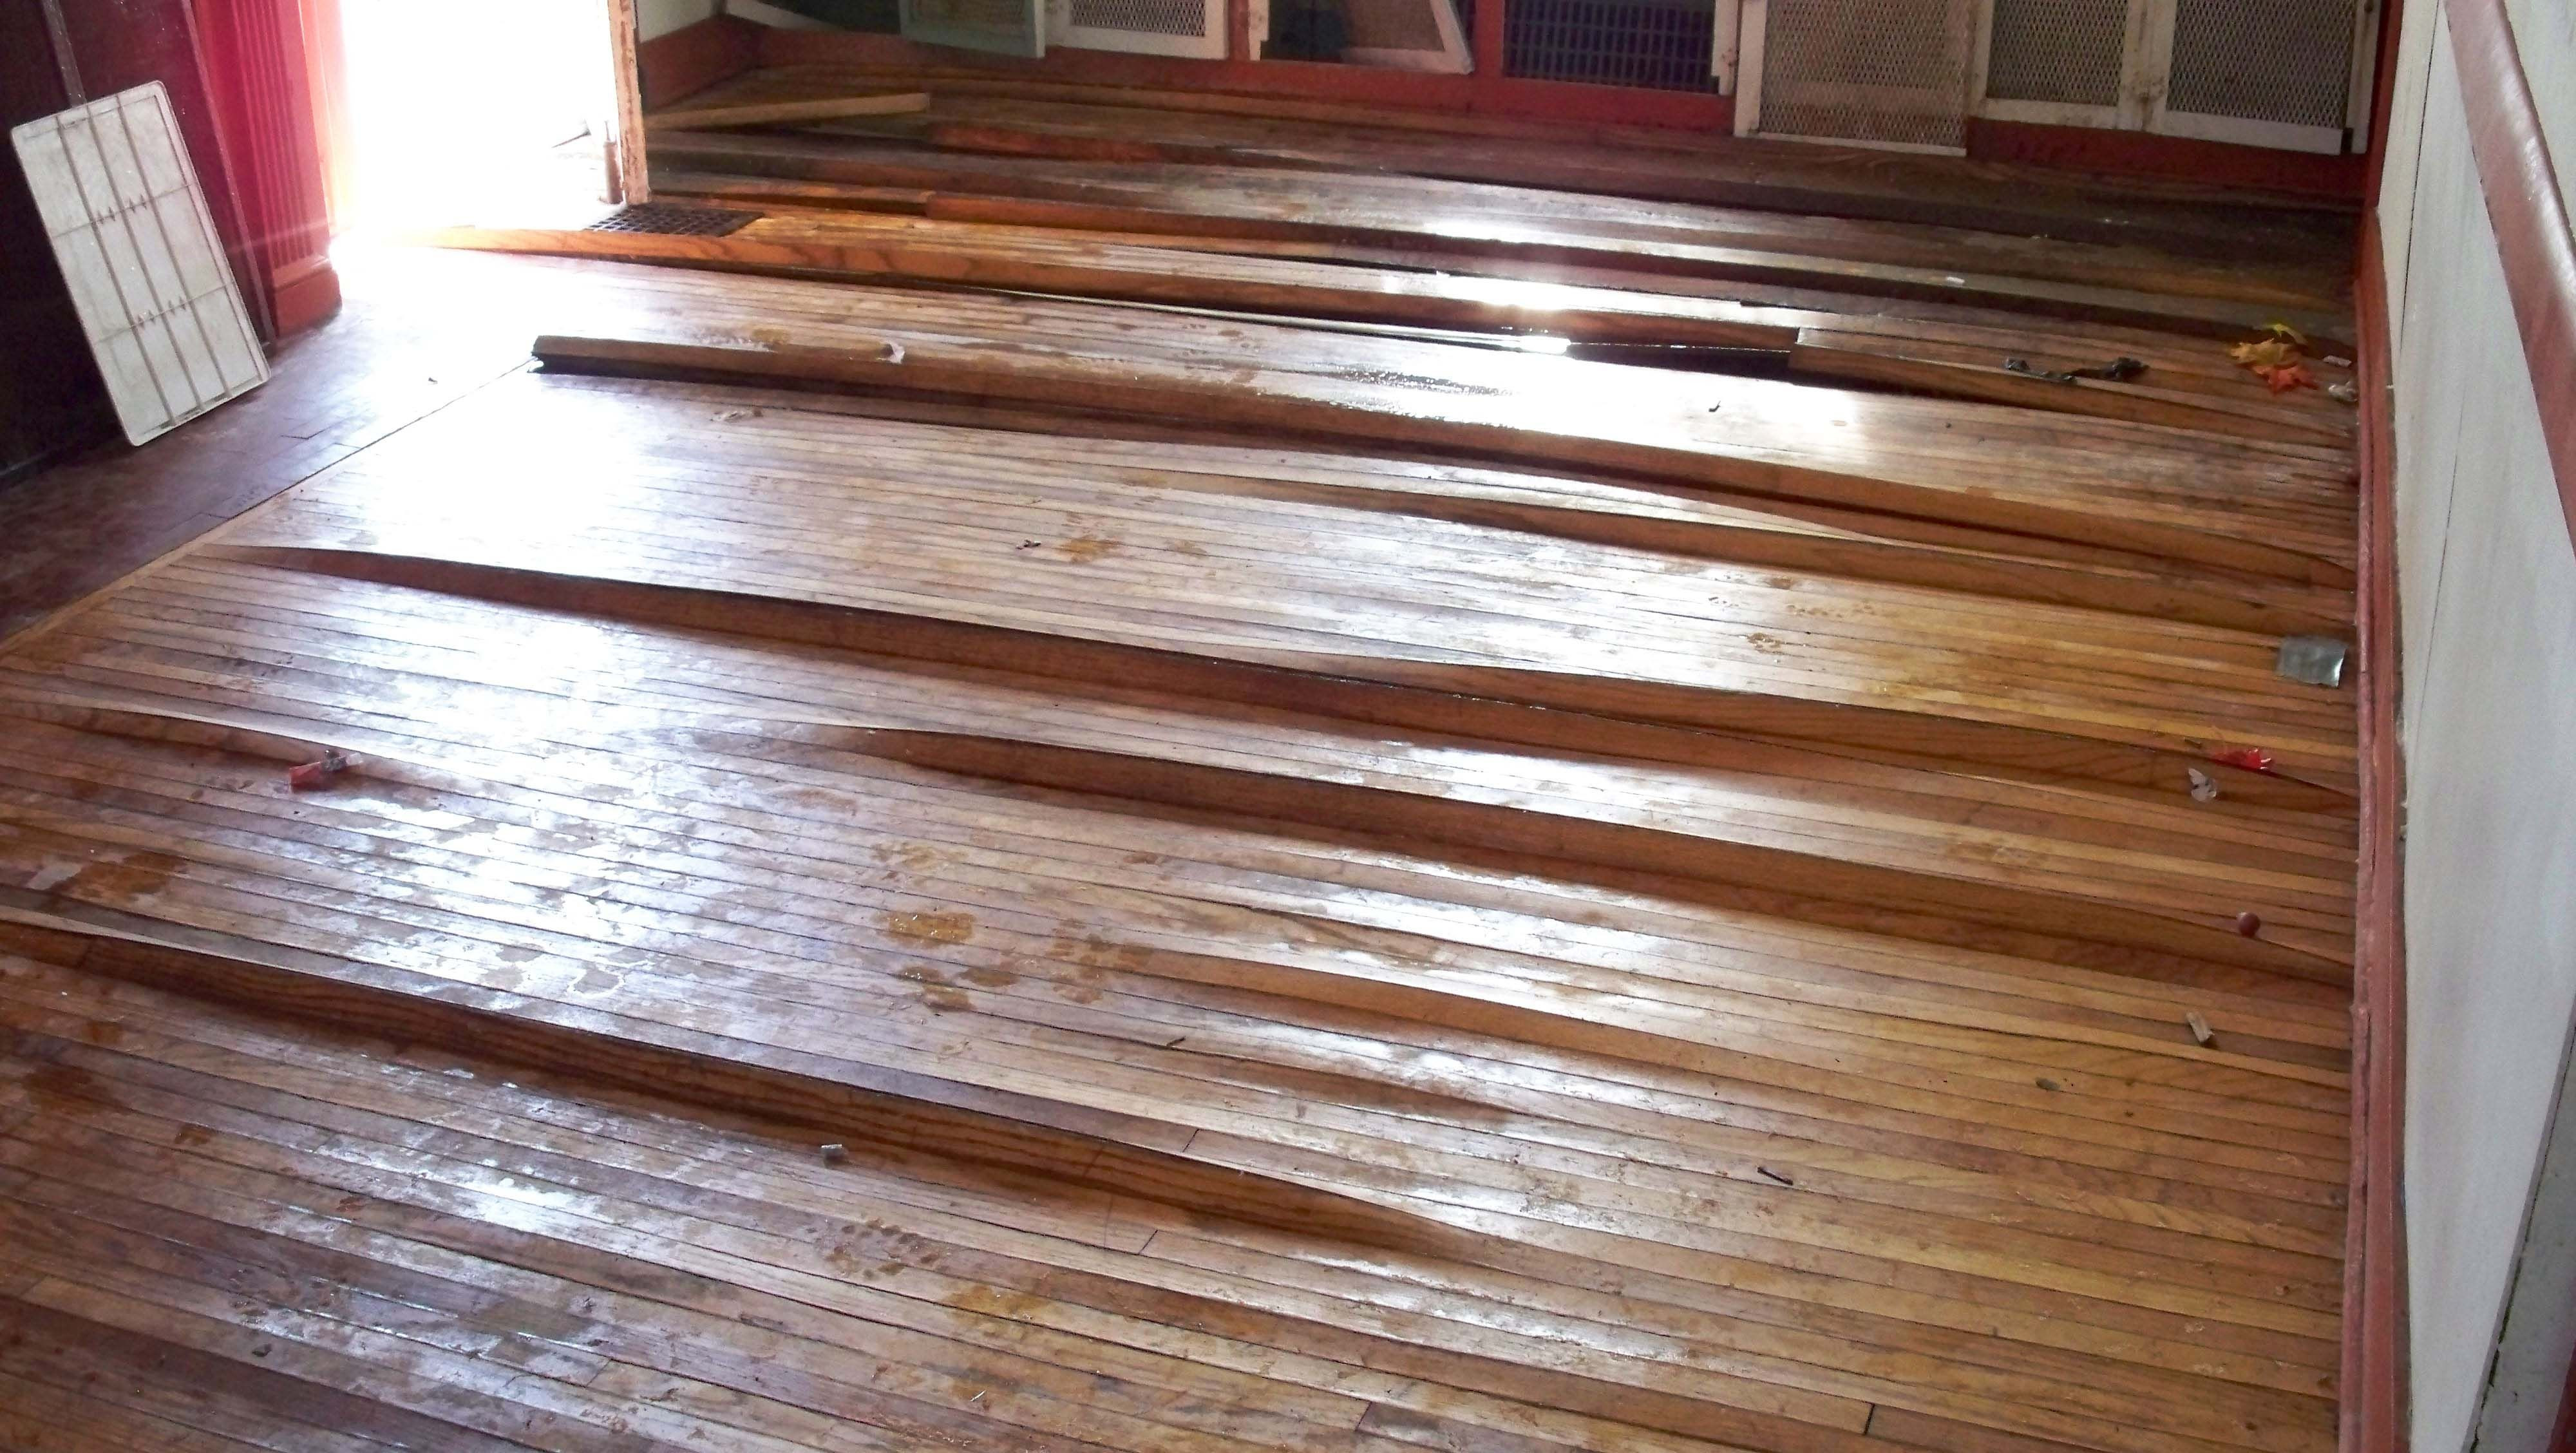 cheap engineered hardwood flooring of hardwood floor water damage warping hardwood floors pinterest in hardwood floor water damage warping